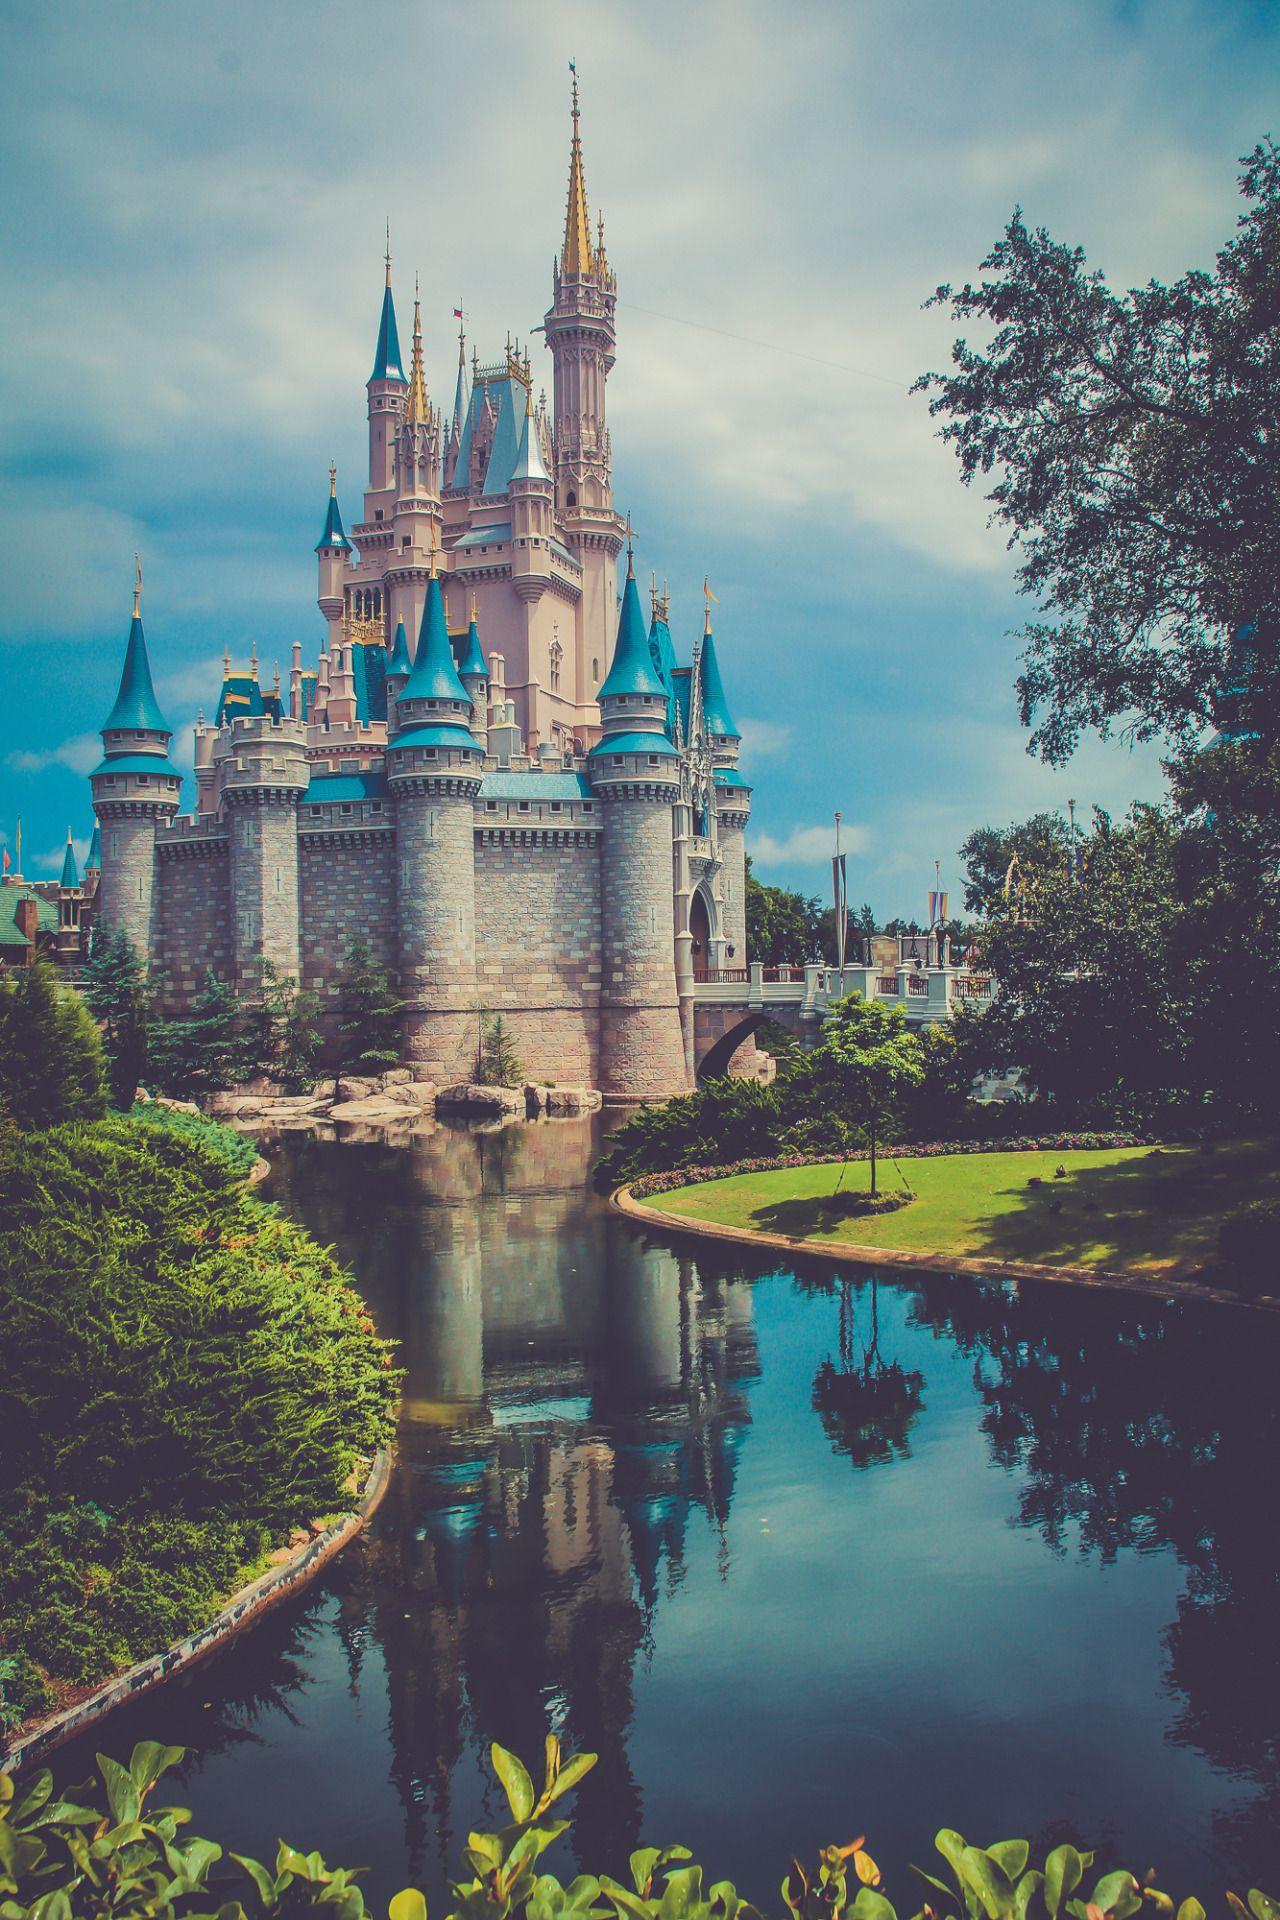 the disney princess Disney world pictures, Disney world